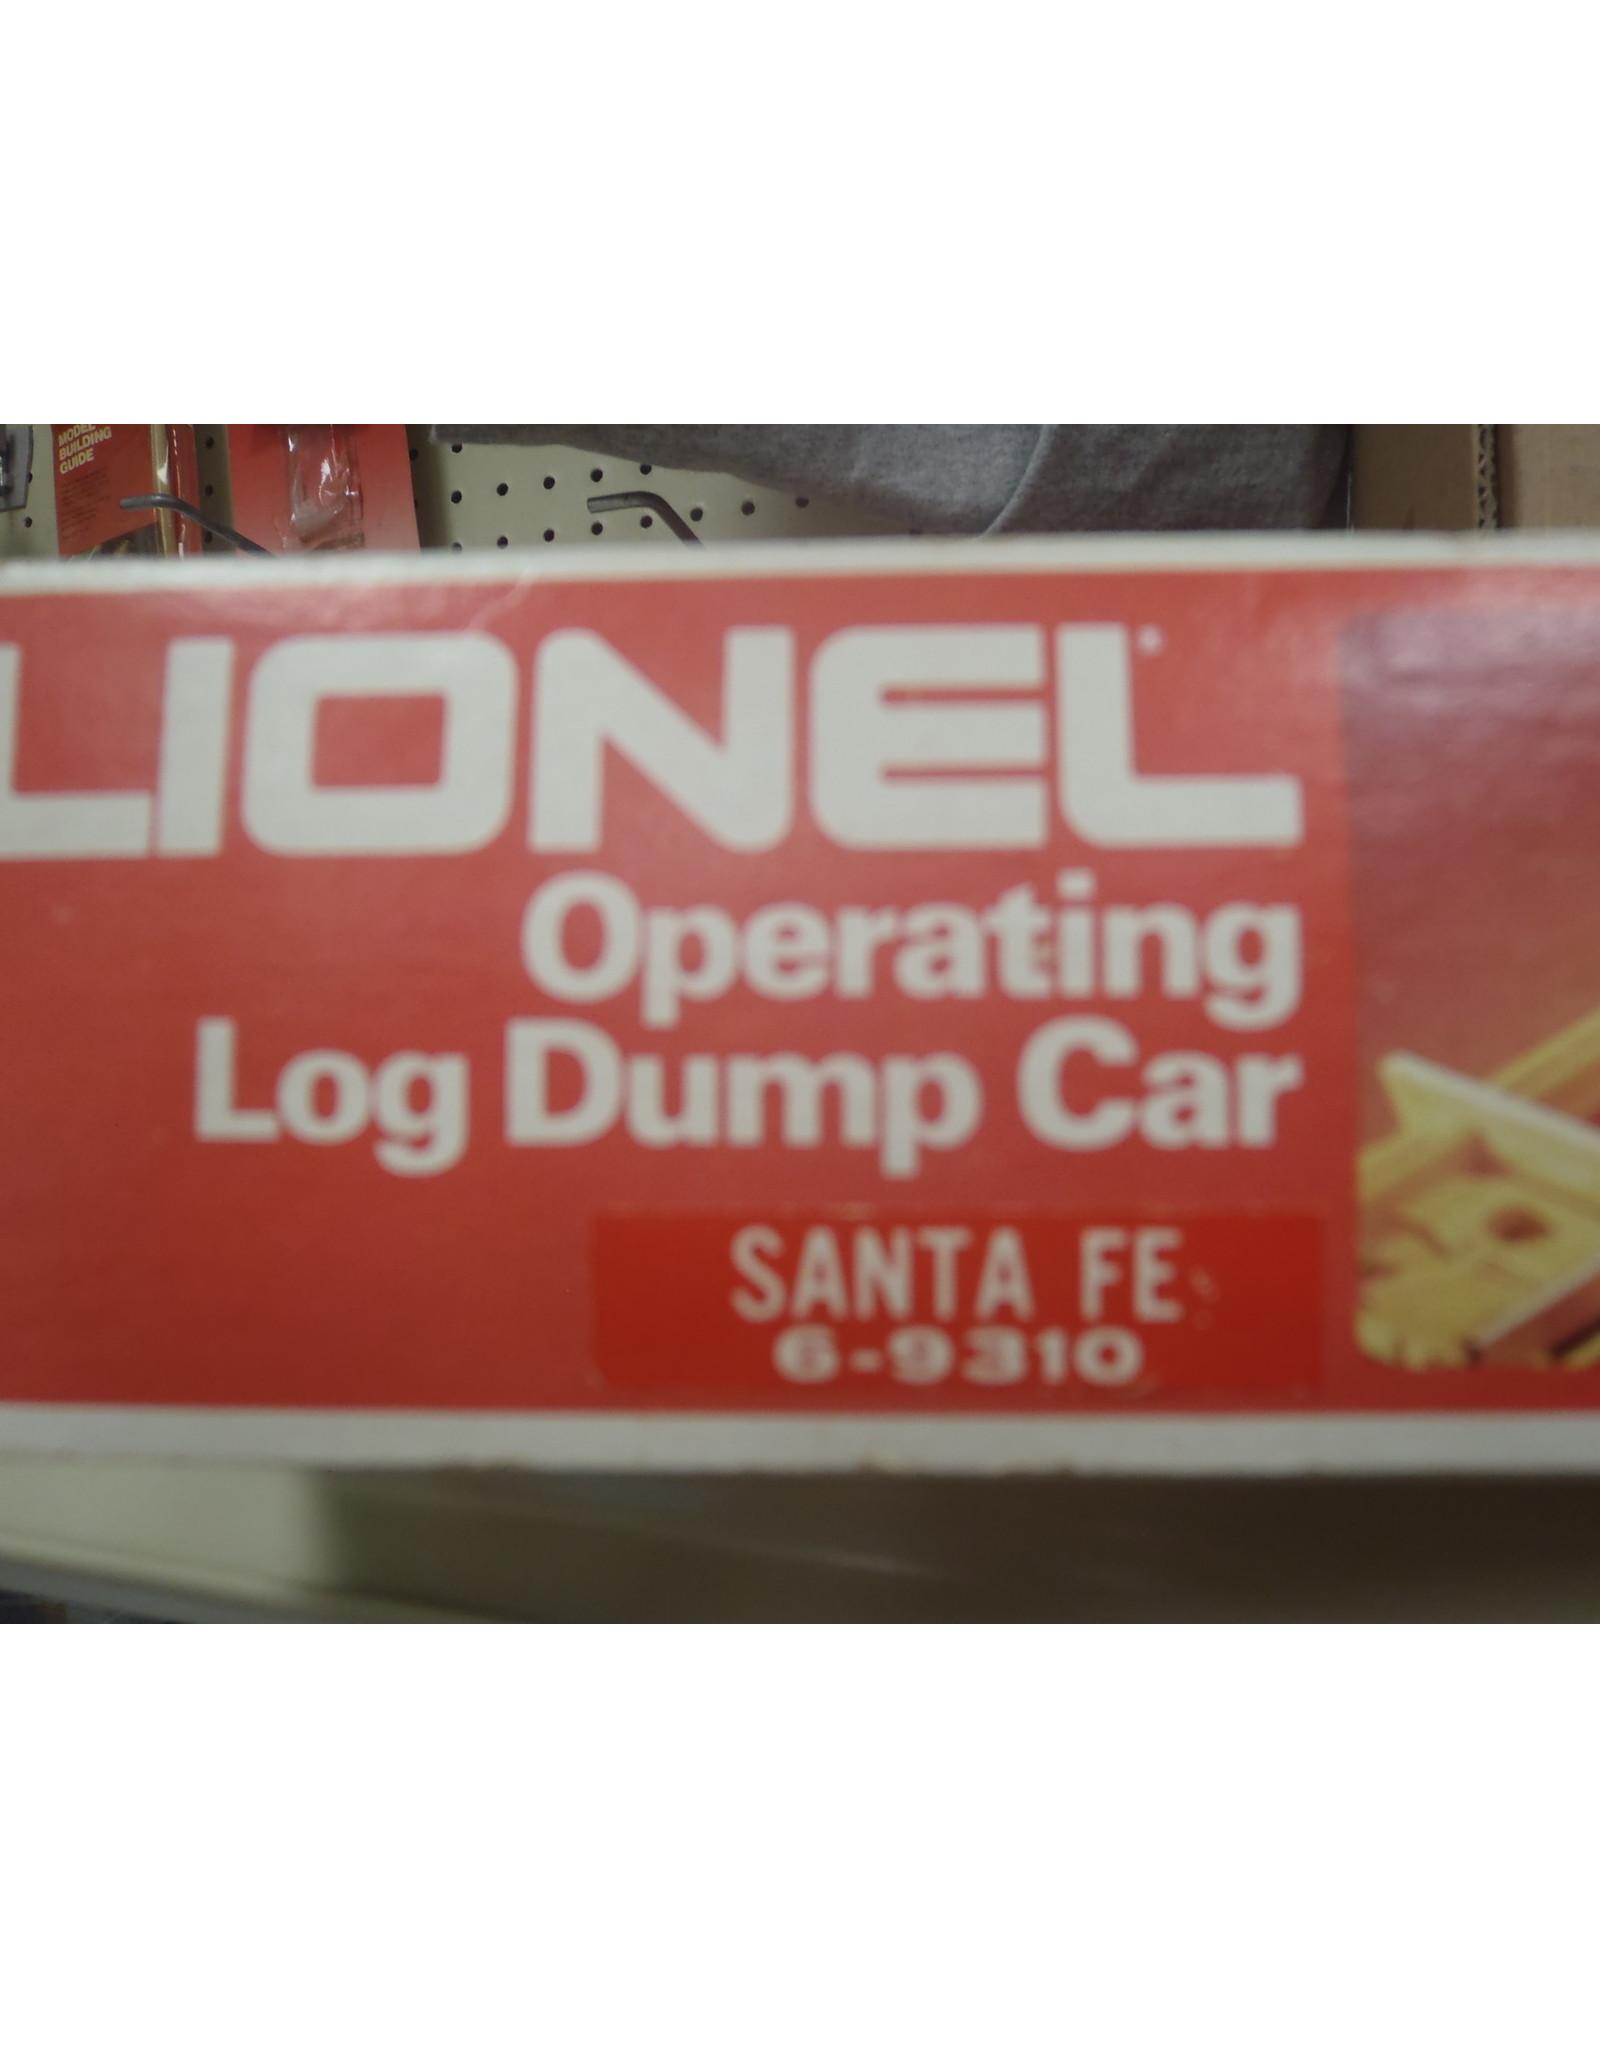 Lionel Operating Log Dump Car